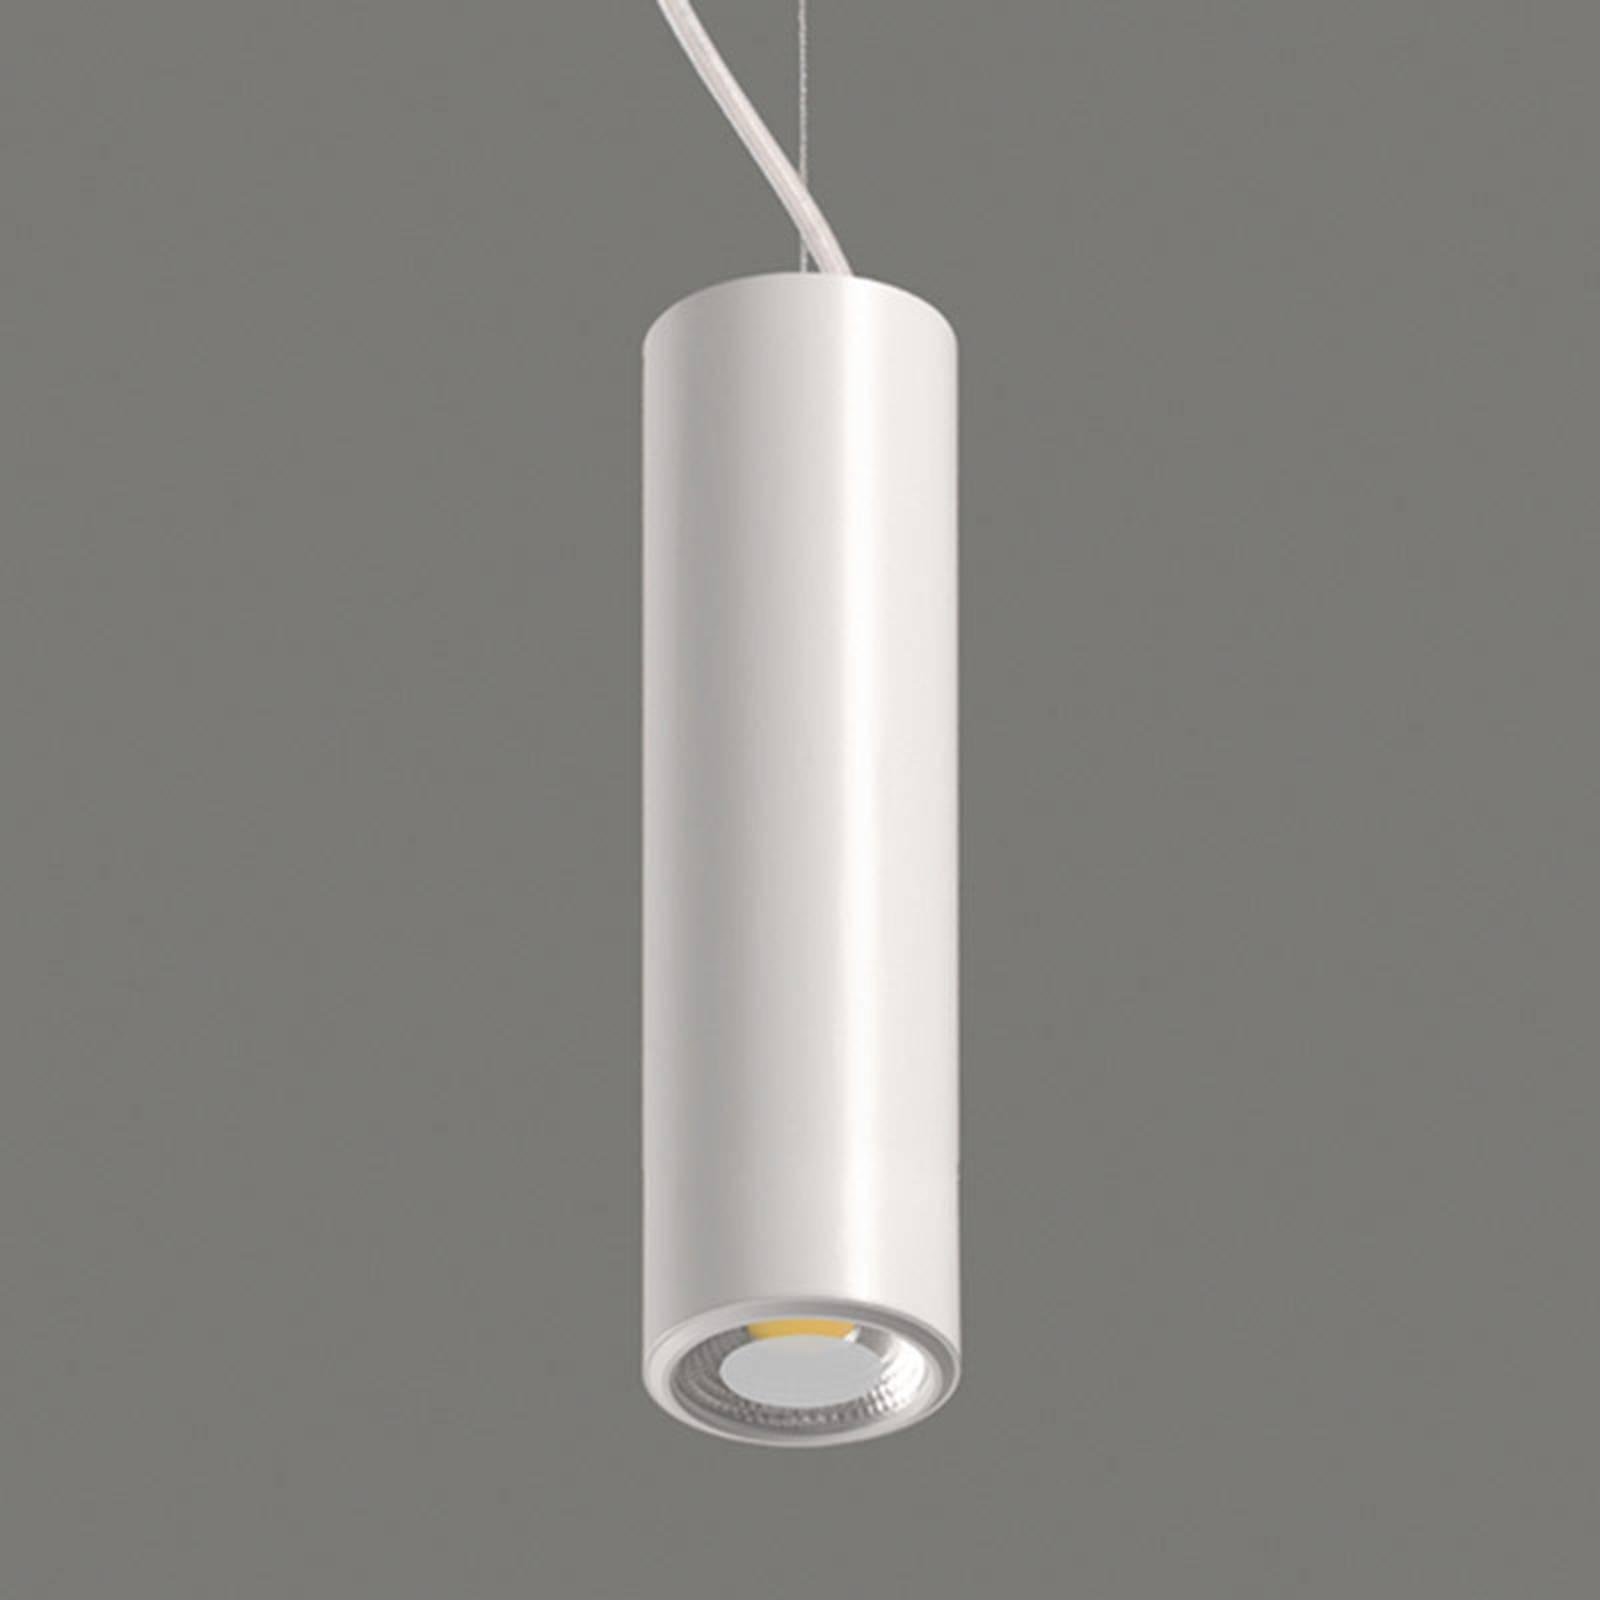 Studio - suspension LED blanche cylindrique